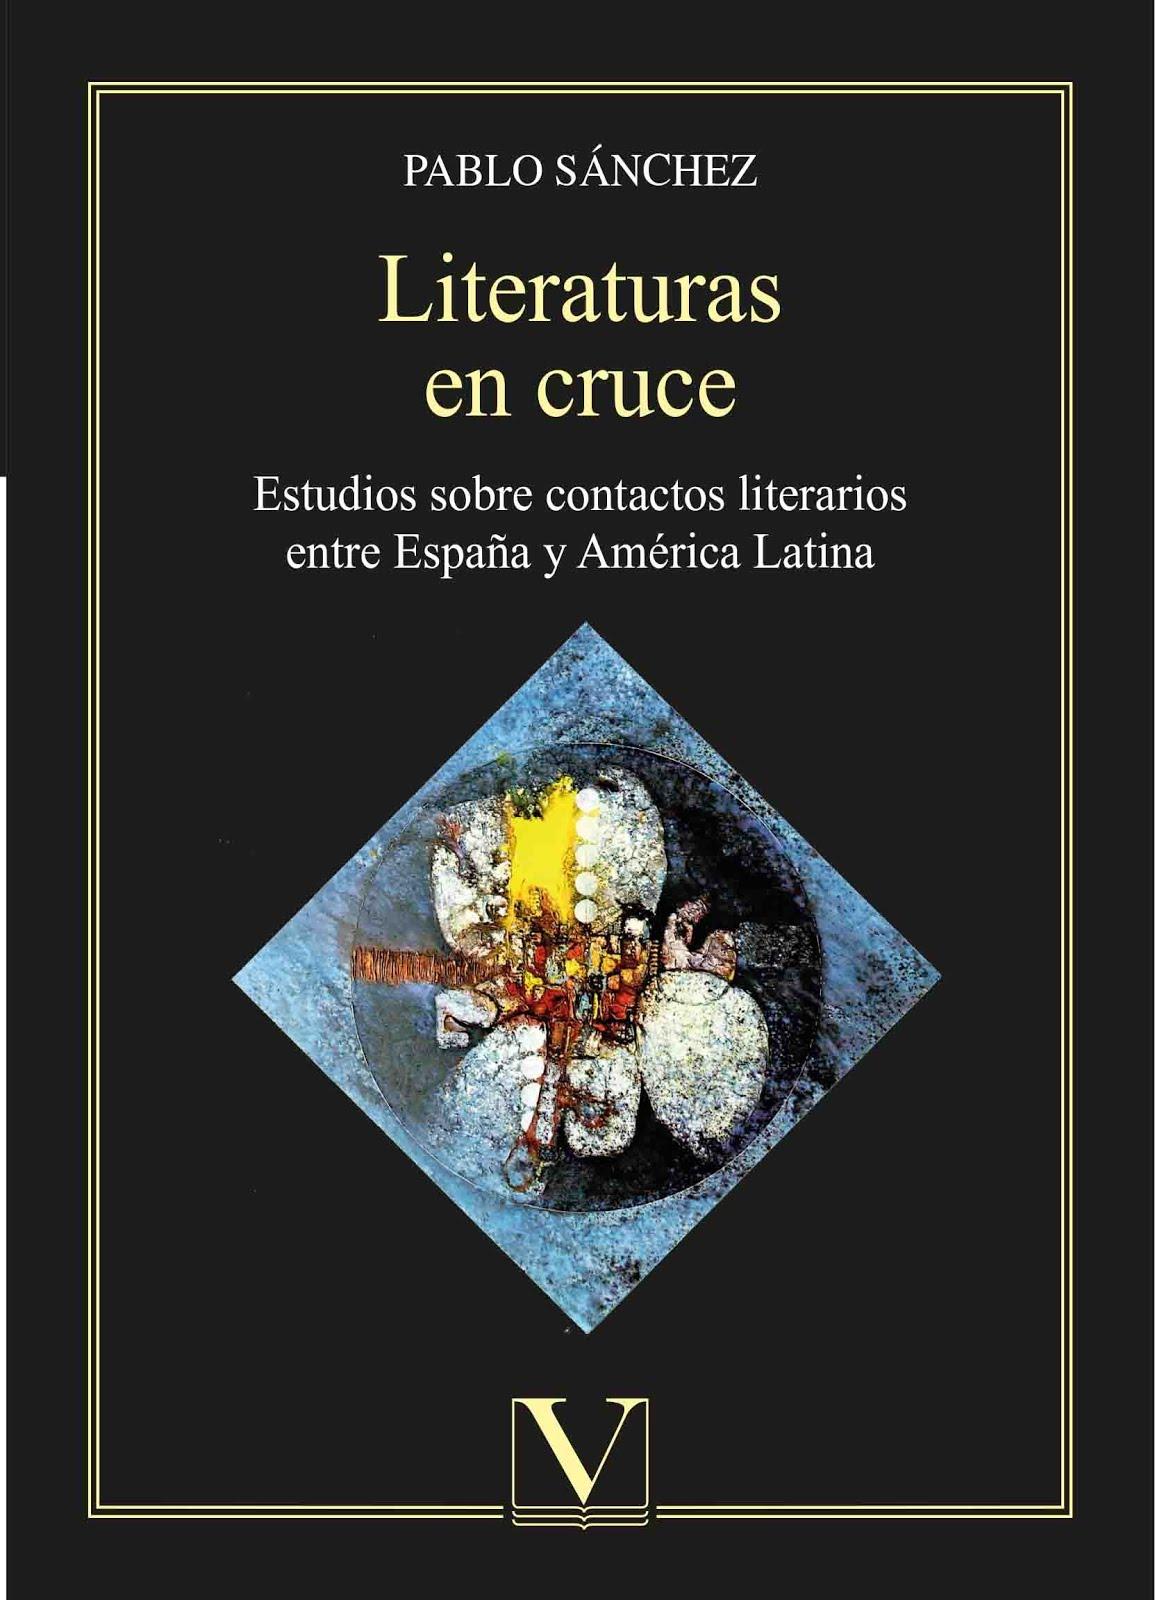 LITERATURAS EN CRUCE. ESTUDIOS SOBRE CONTACTOS LITERARIOS ENTRE ESPAÑA Y AMÉRICA LATINA